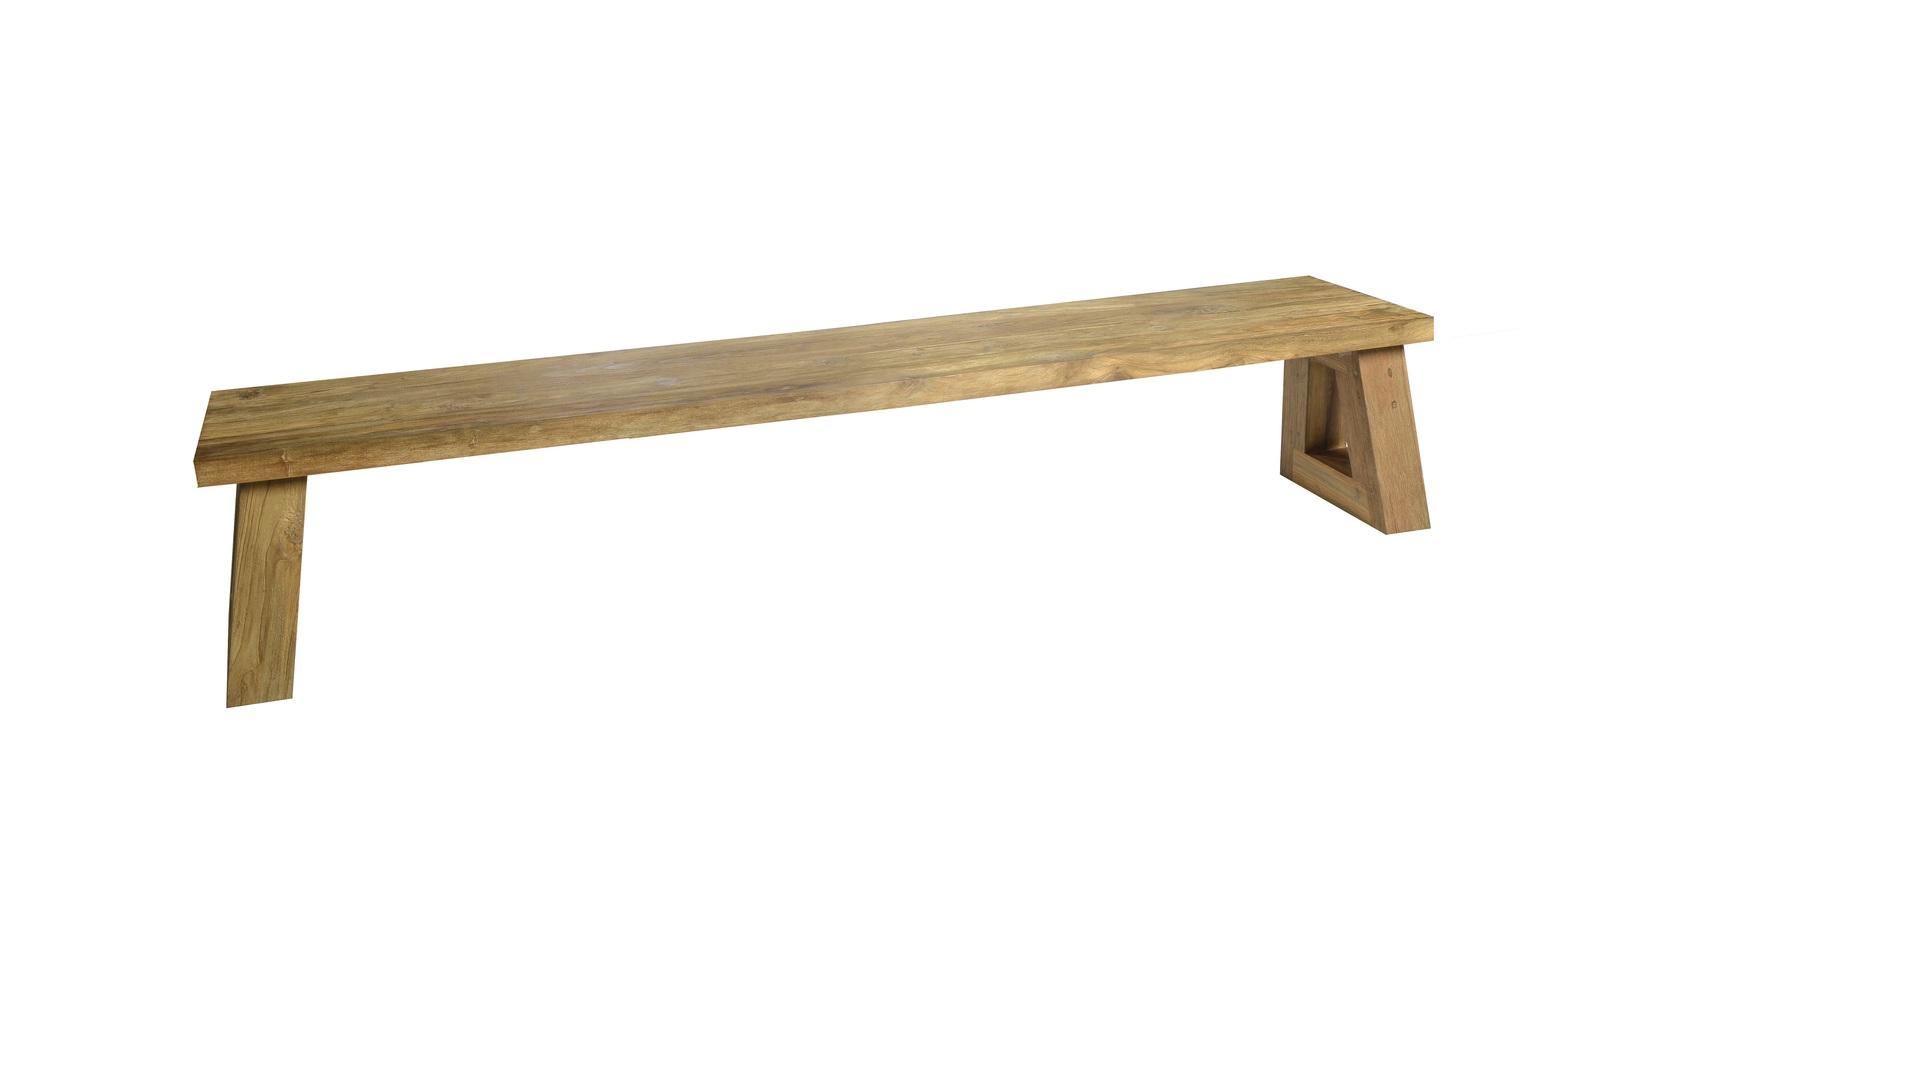 2020 Borek teak Parga backless bench 250x40 7361 2.jpg